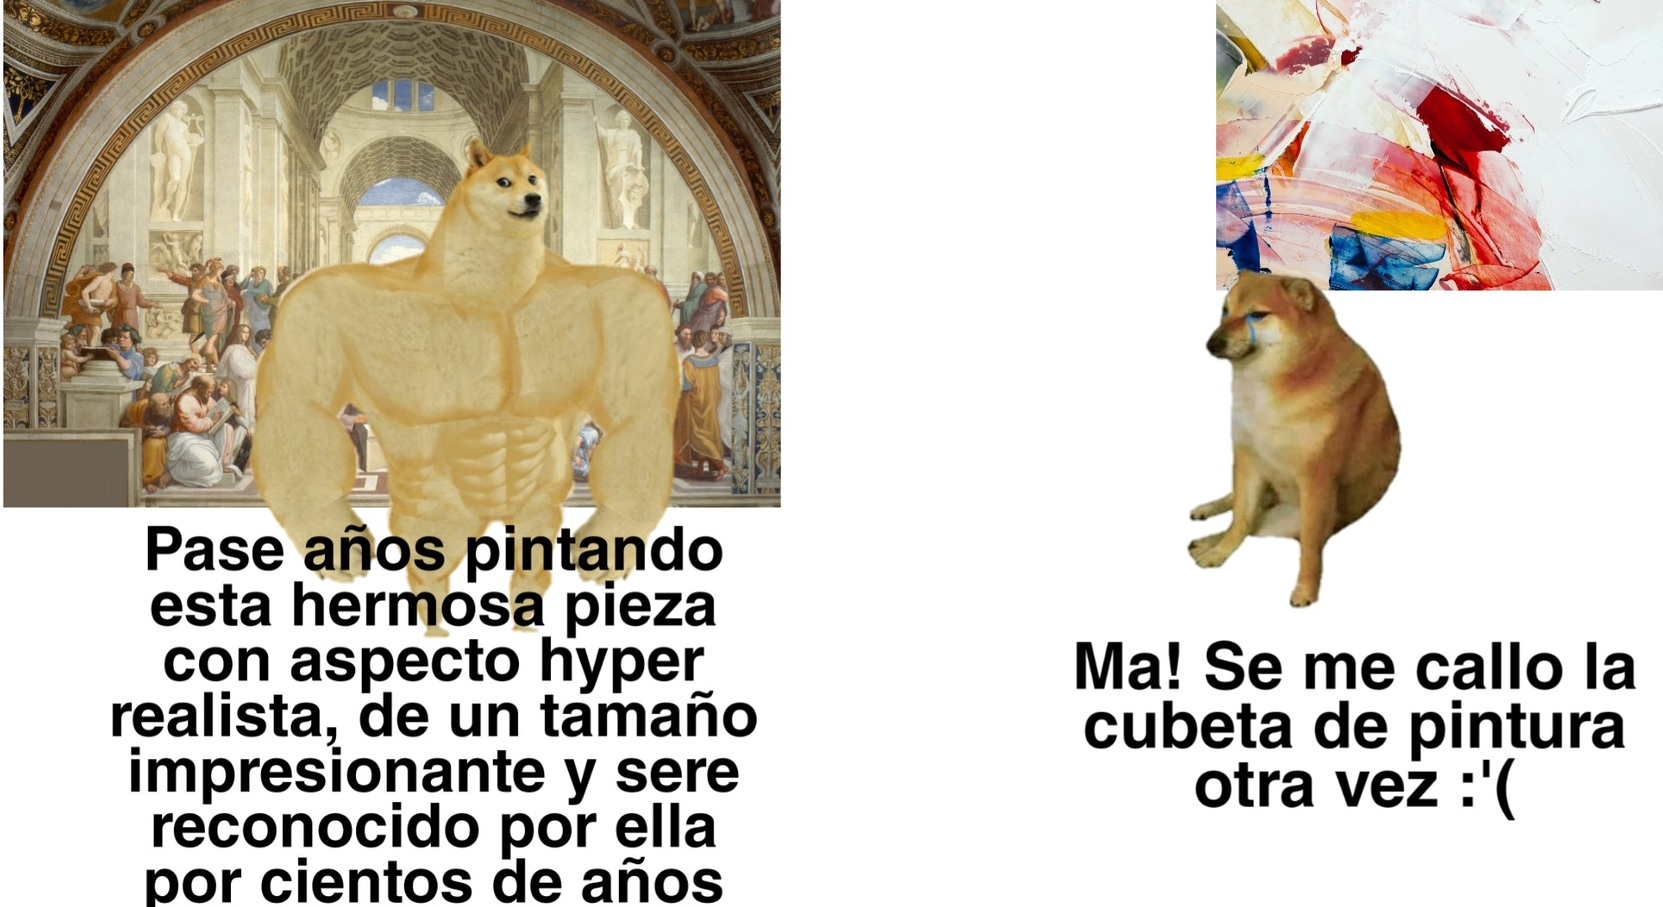 El nuevo arte apesta - meme